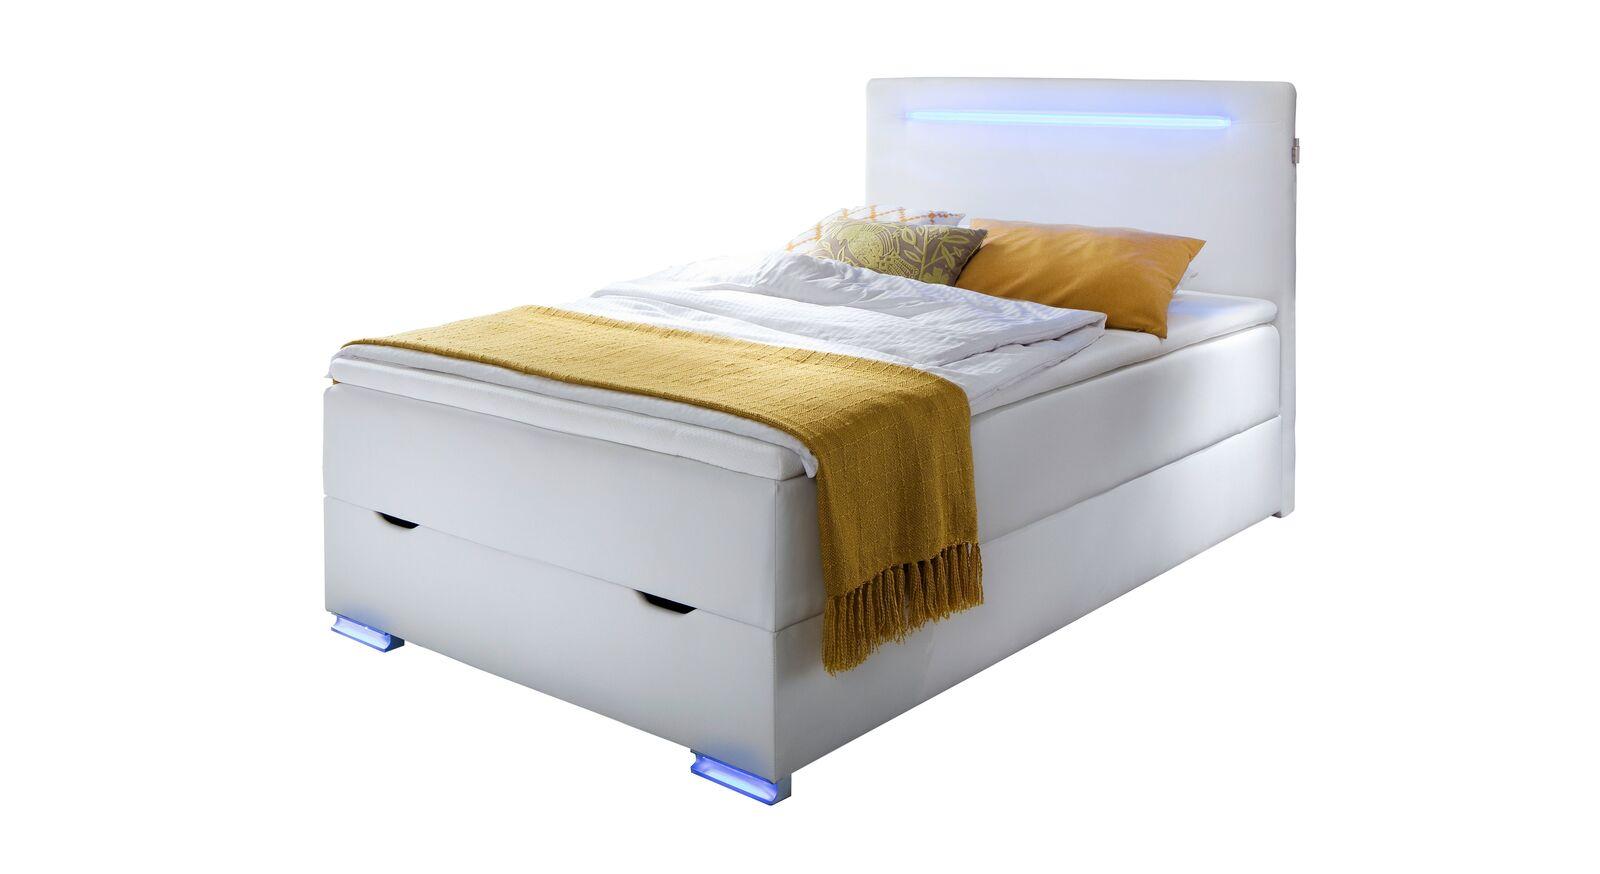 Bettkasten-Boxspringbett Iniko mit 140x200 cm